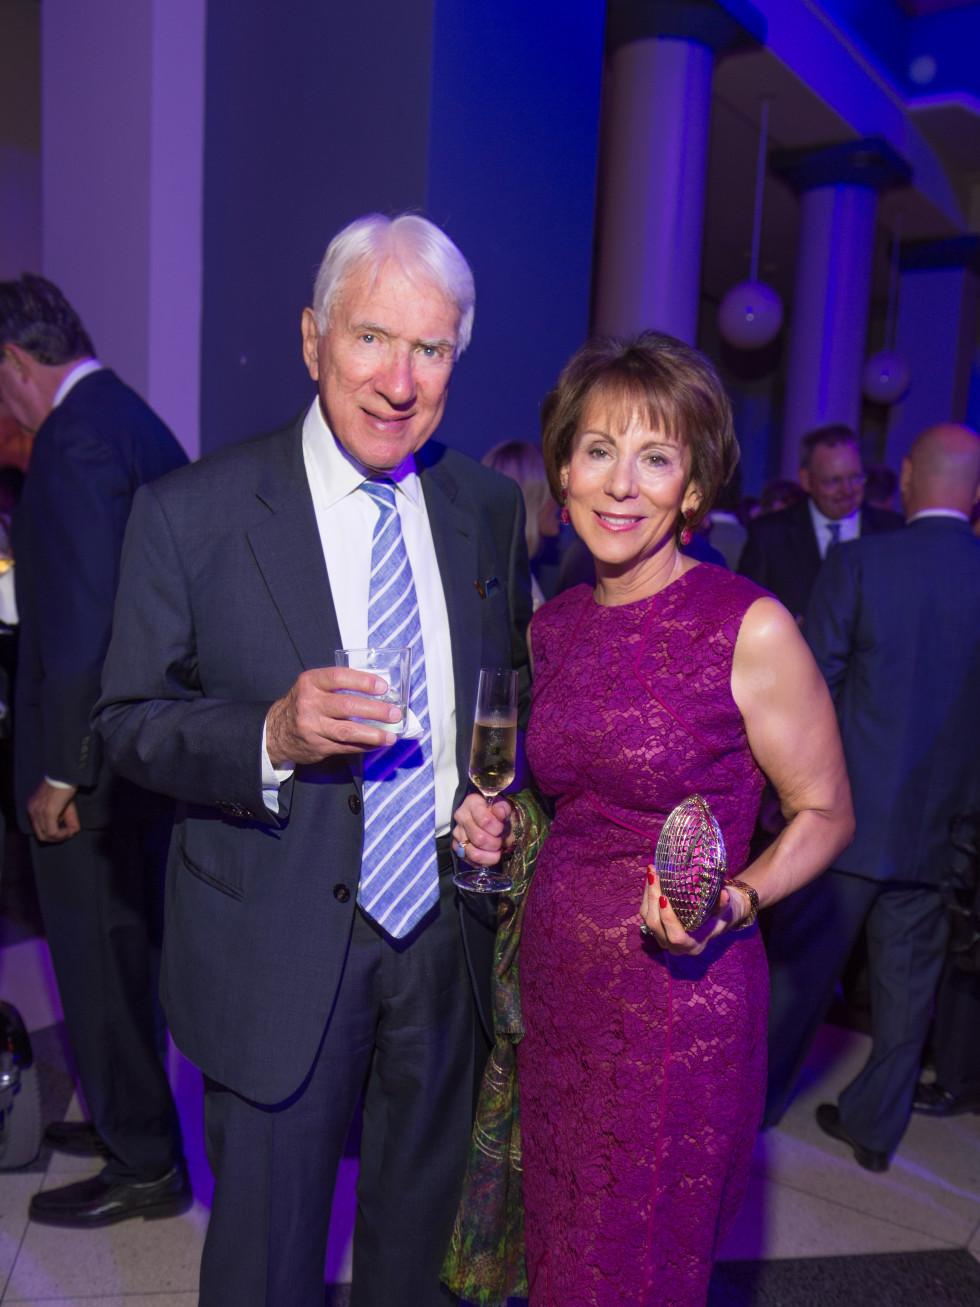 News, Shelby, Gerald Hines 90th birthday, Sept. 2015,Gene & Barbara Kohn